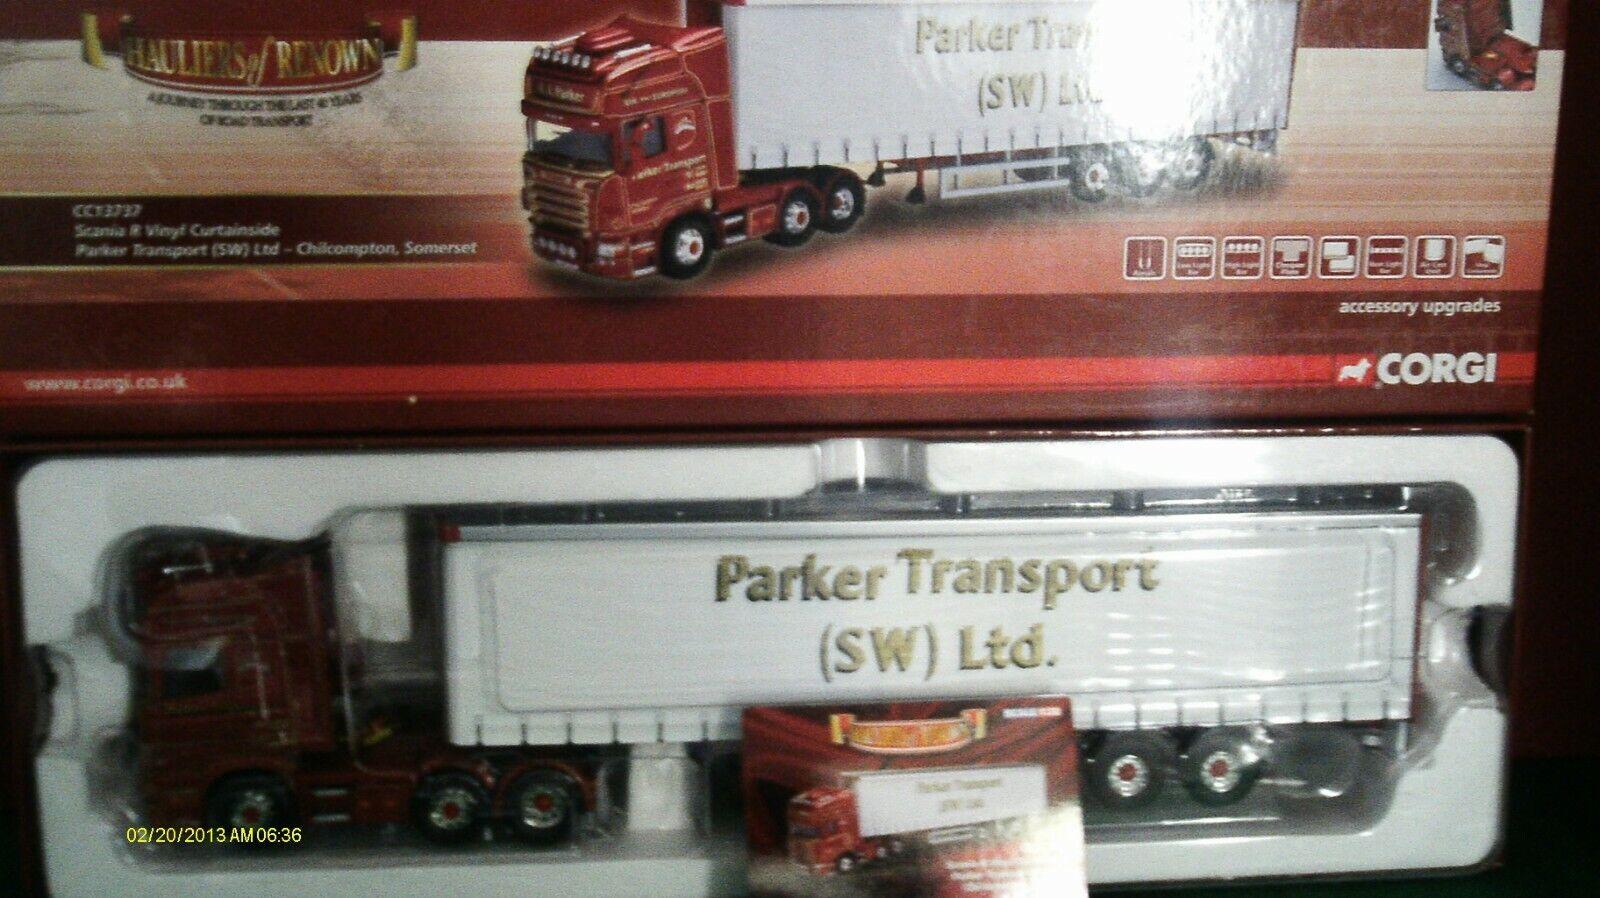 ti aspetto CORGI moderno camion trasporto merci pesanti pesanti pesanti CC13737 SCANIA CURTAINSIDE PARKER trasporto 1 50  80% di sconto